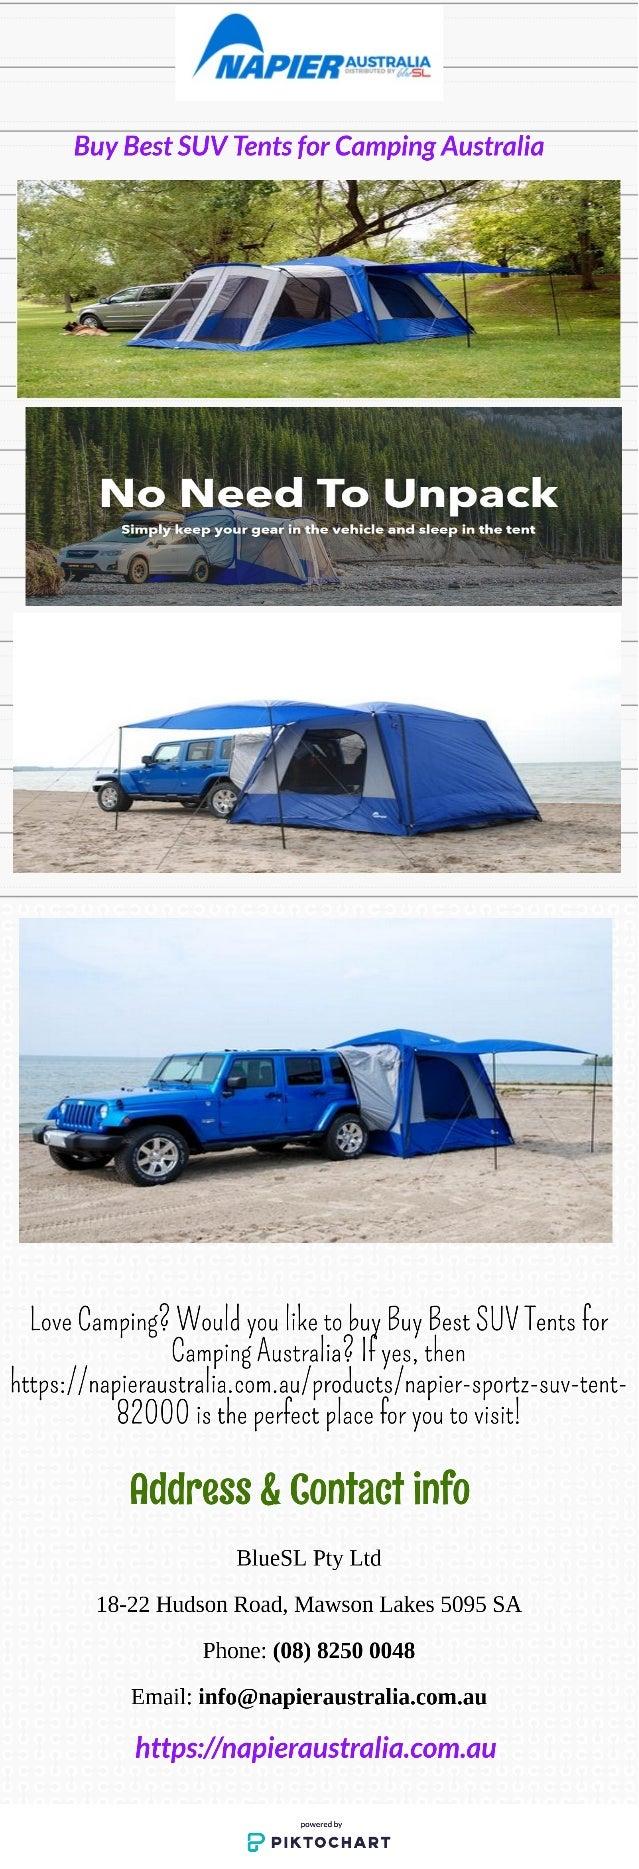 Buy Best SUV Tents for Camping Australia - Napieraustralia